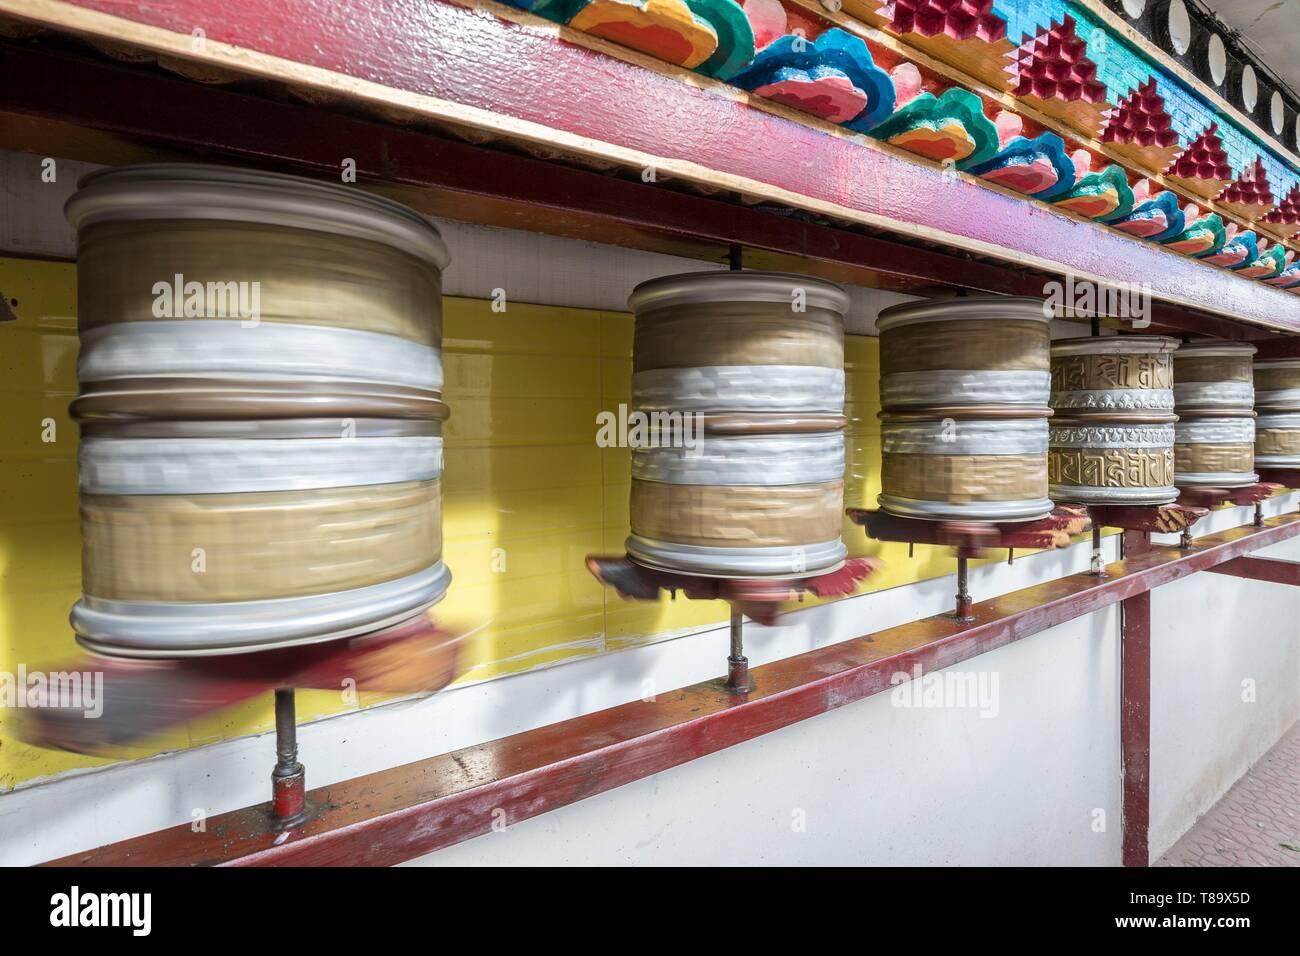 India, Jammu and Kashmir State, Himalaya, Ladakh, Indus valley,Leh (3500m), régional capital, prayer wheels of the Buddhist temple of Gompa Soma (Chokhang) - Stock Image